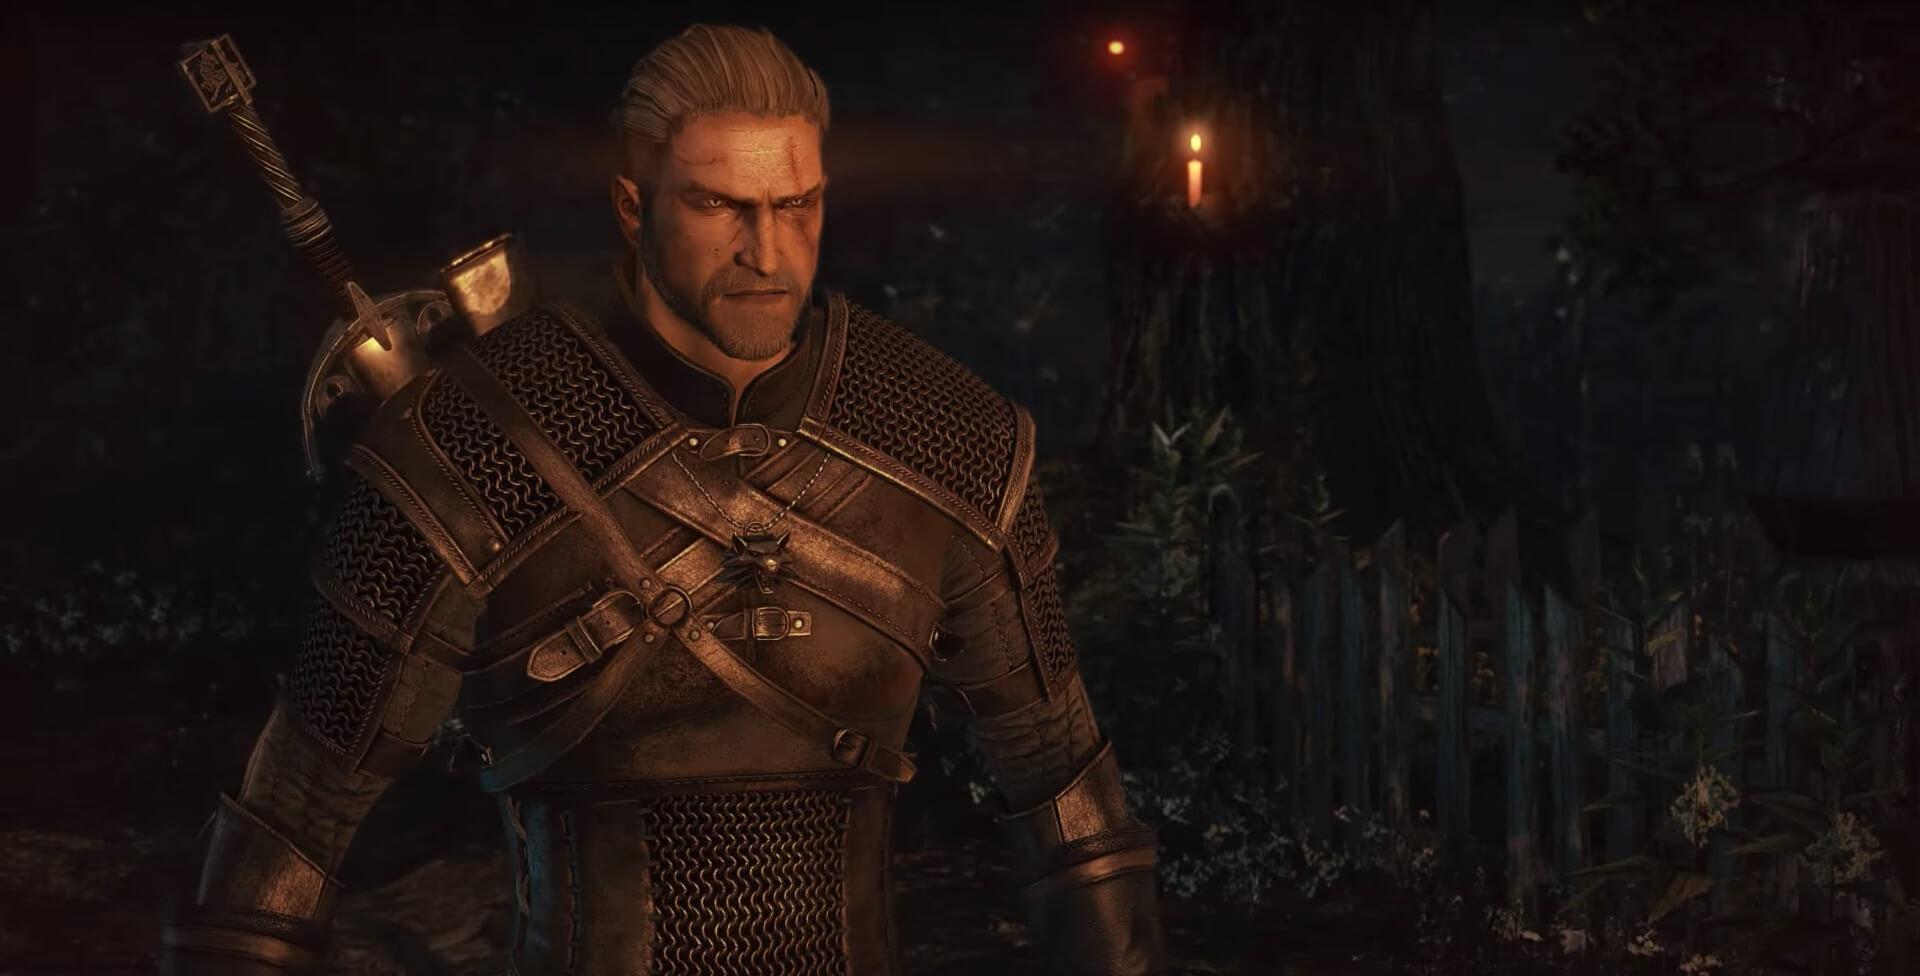 Geralt - The Witcher 3